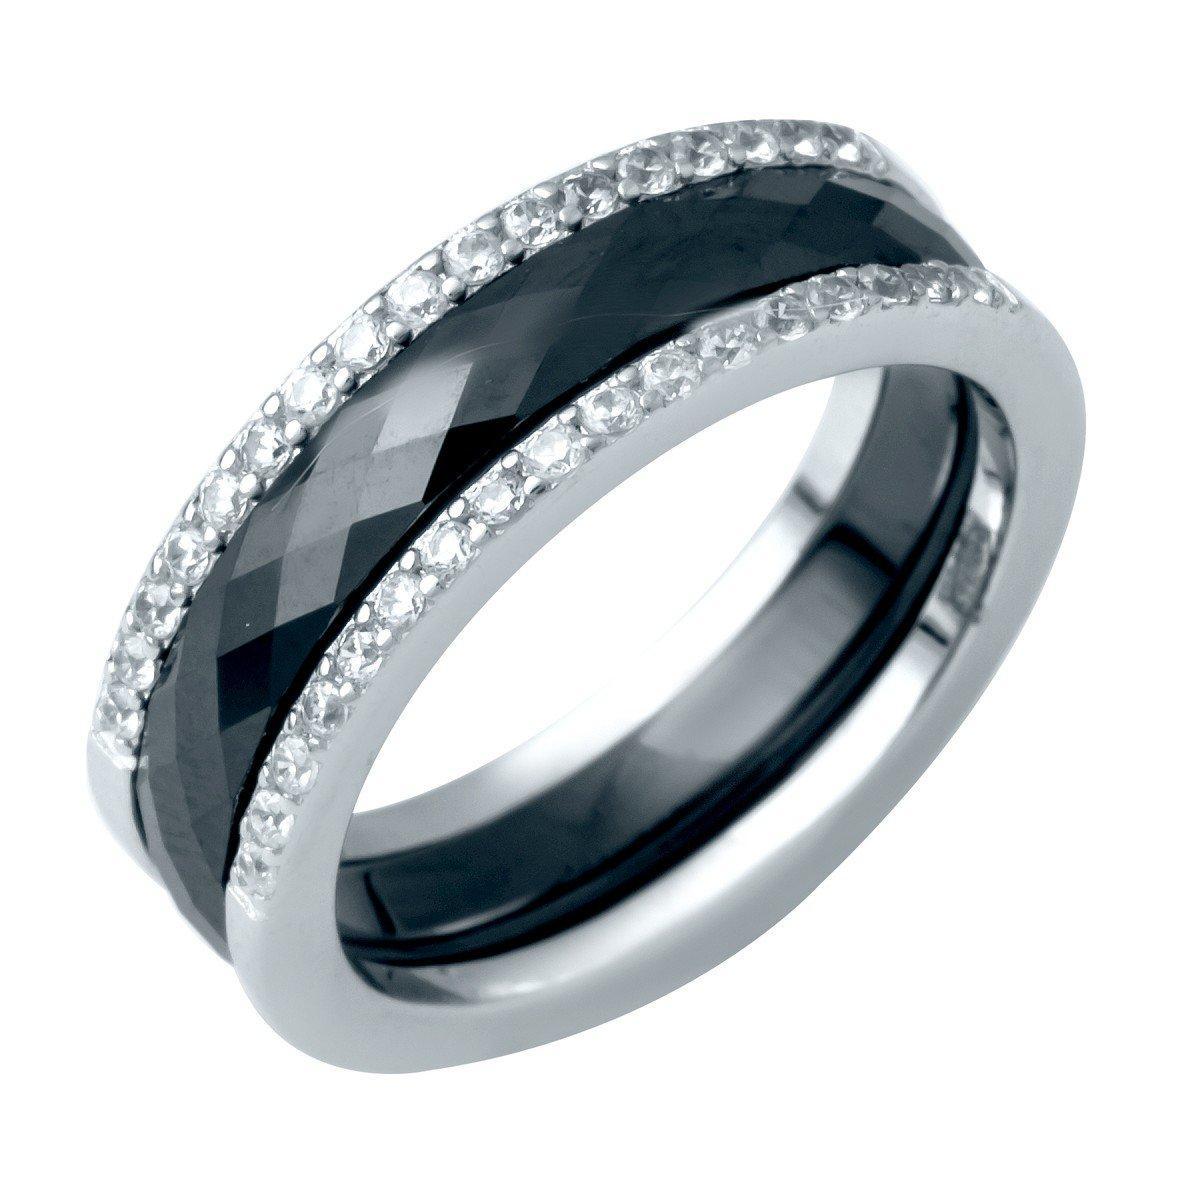 Серебряное кольцо DreamJewelry с керамикой (1214503) 18 размер